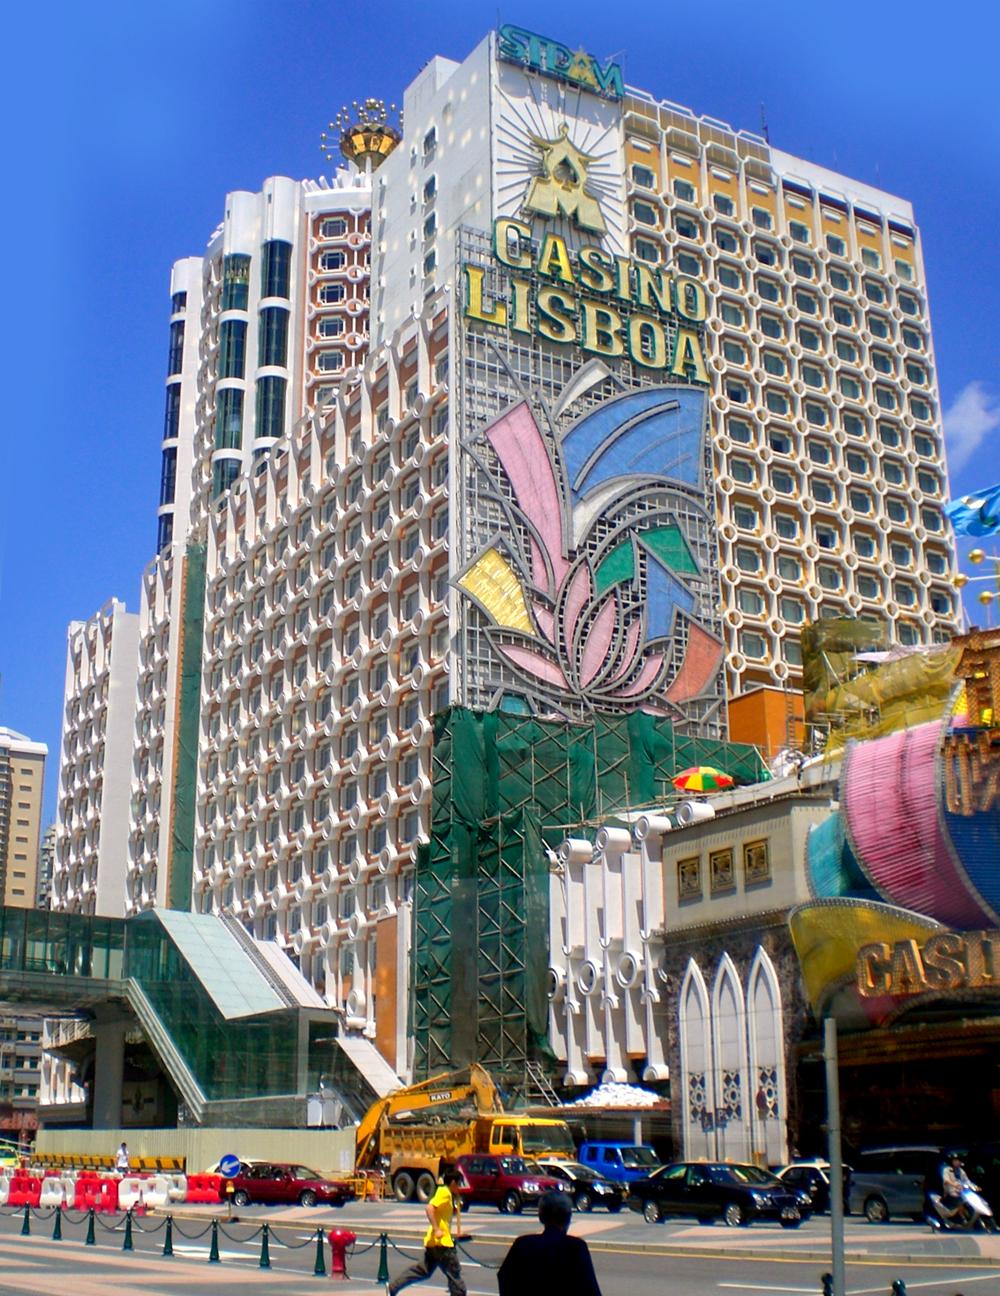 2013-06-12 Macao Hotel Lisboa.jpg